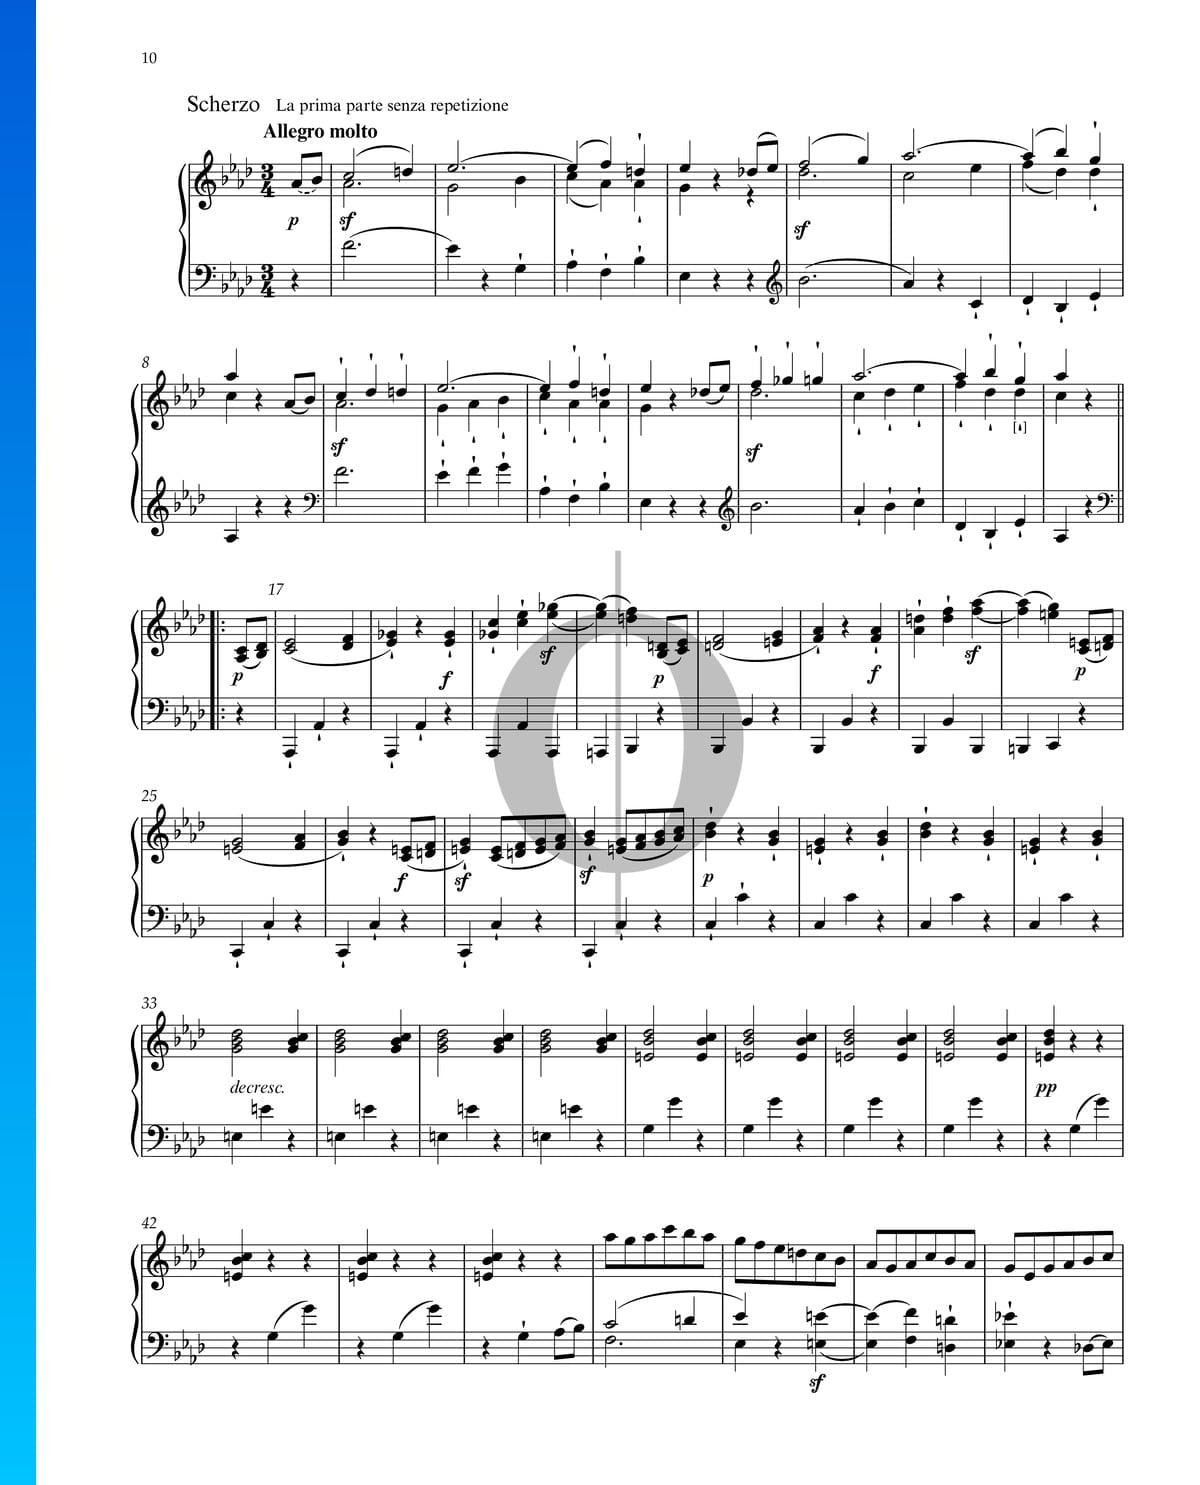 Grande Sonata Funeral March Op 26 2 Scherzo